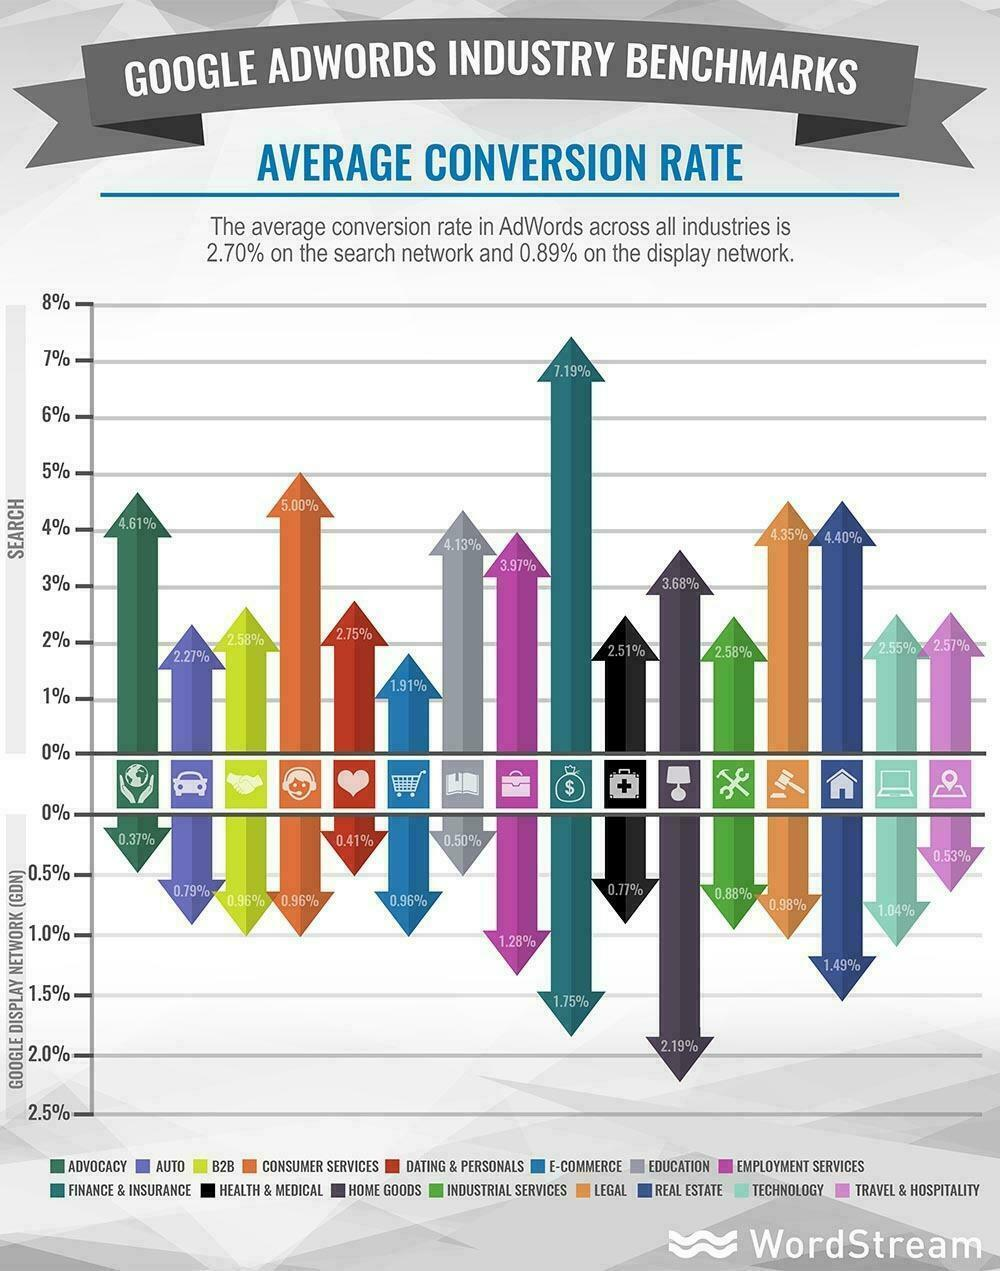 Google RankBrain average conversion rates